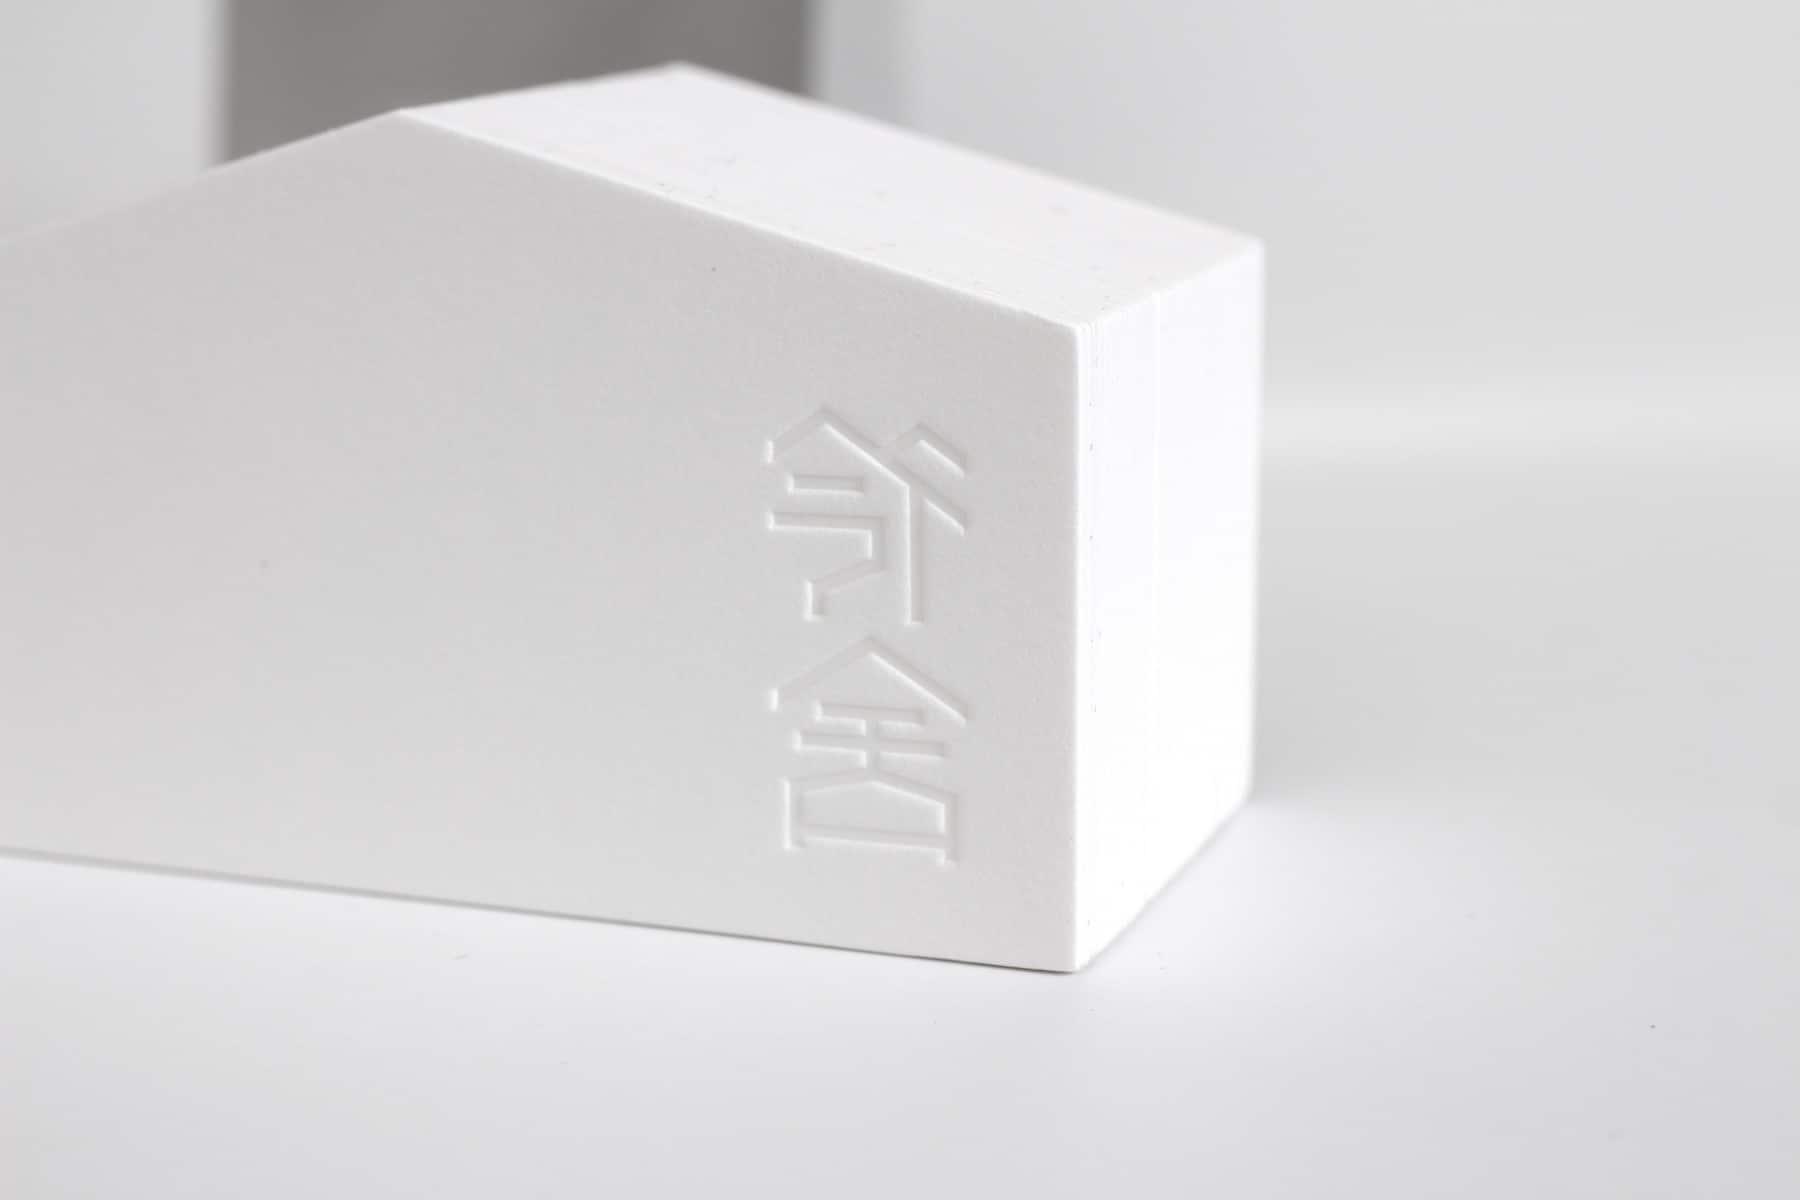 Communication Arts Typography 2019 - Lane House 邻舍